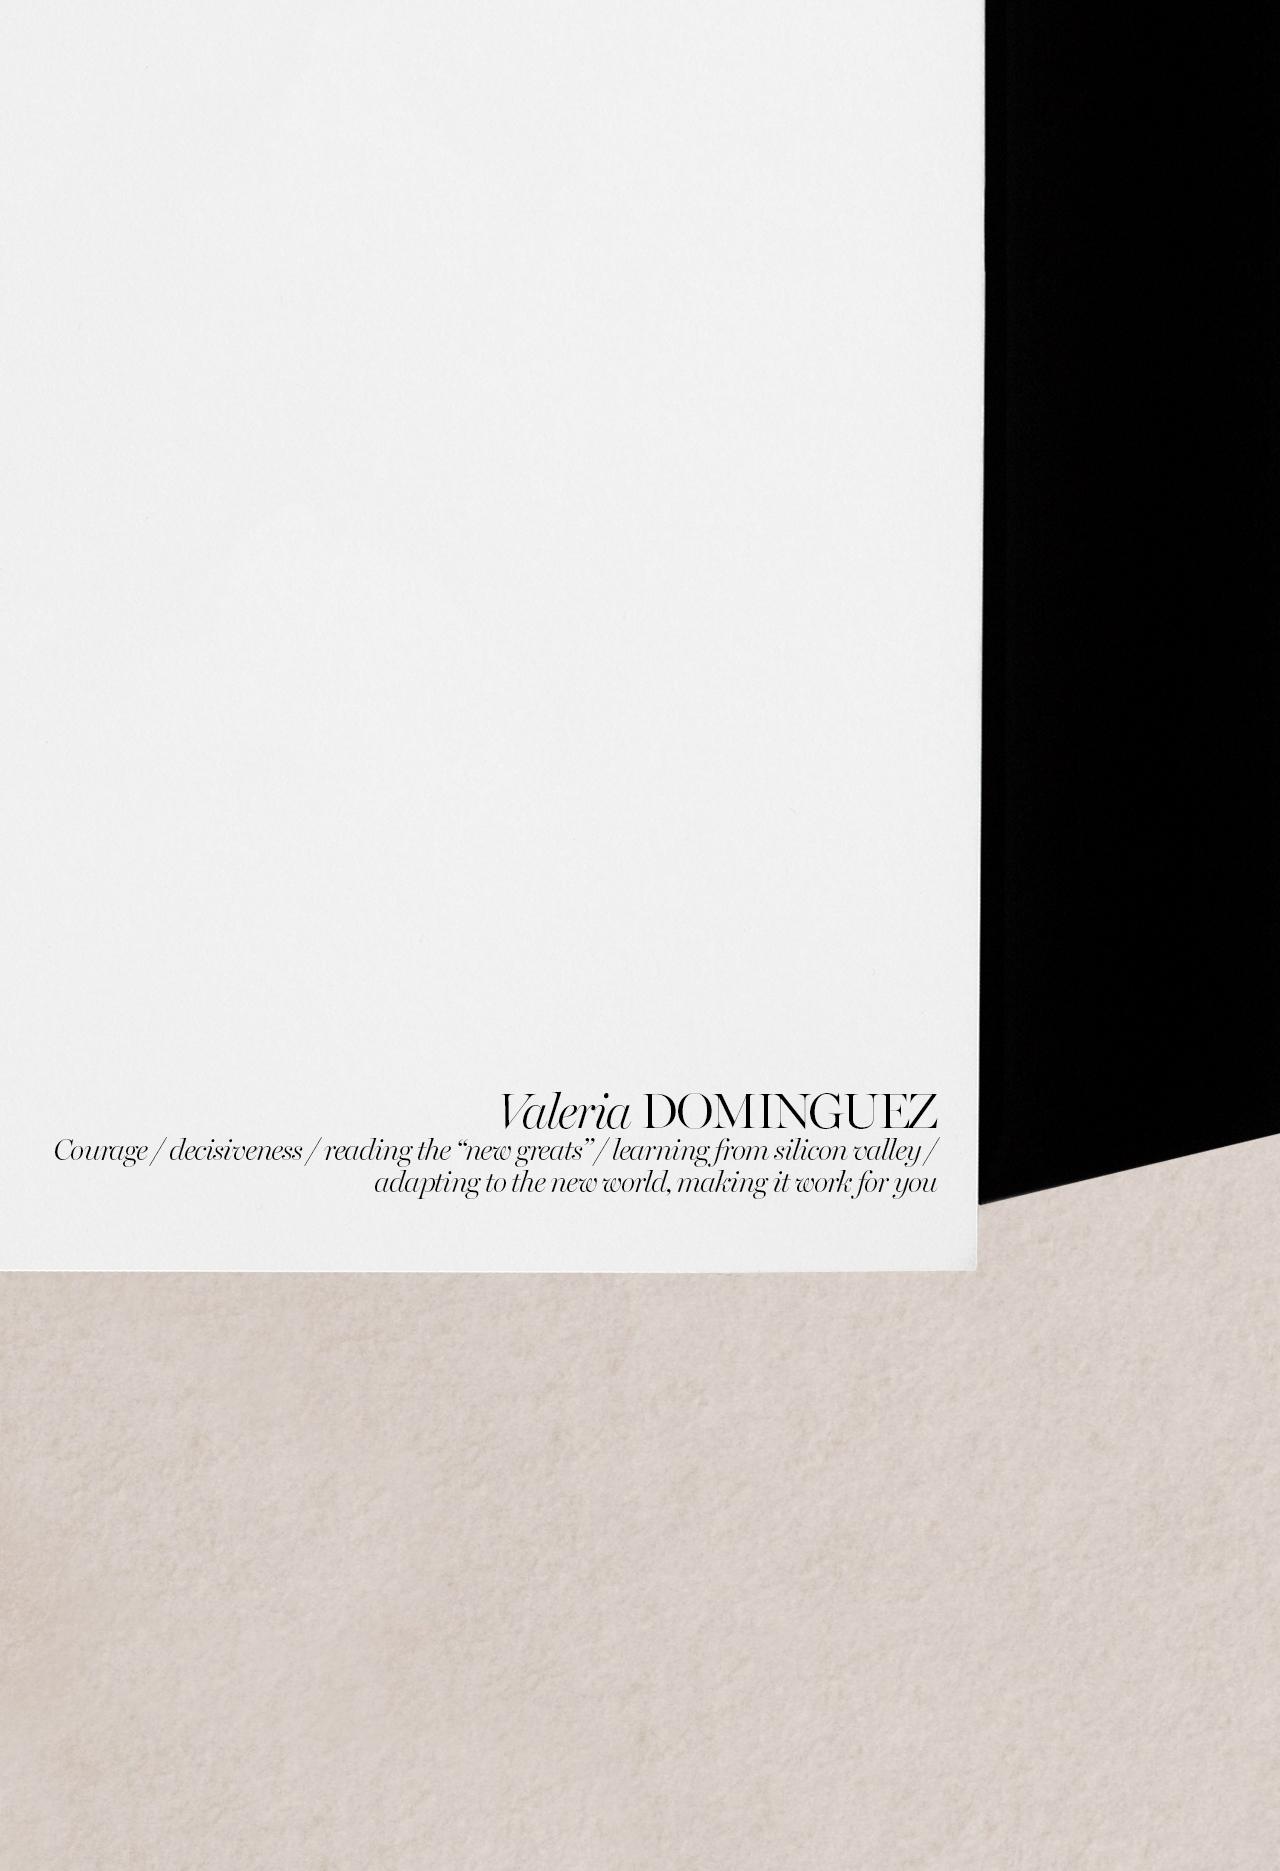 branding-valeria-dominguez-behance-3.jpg